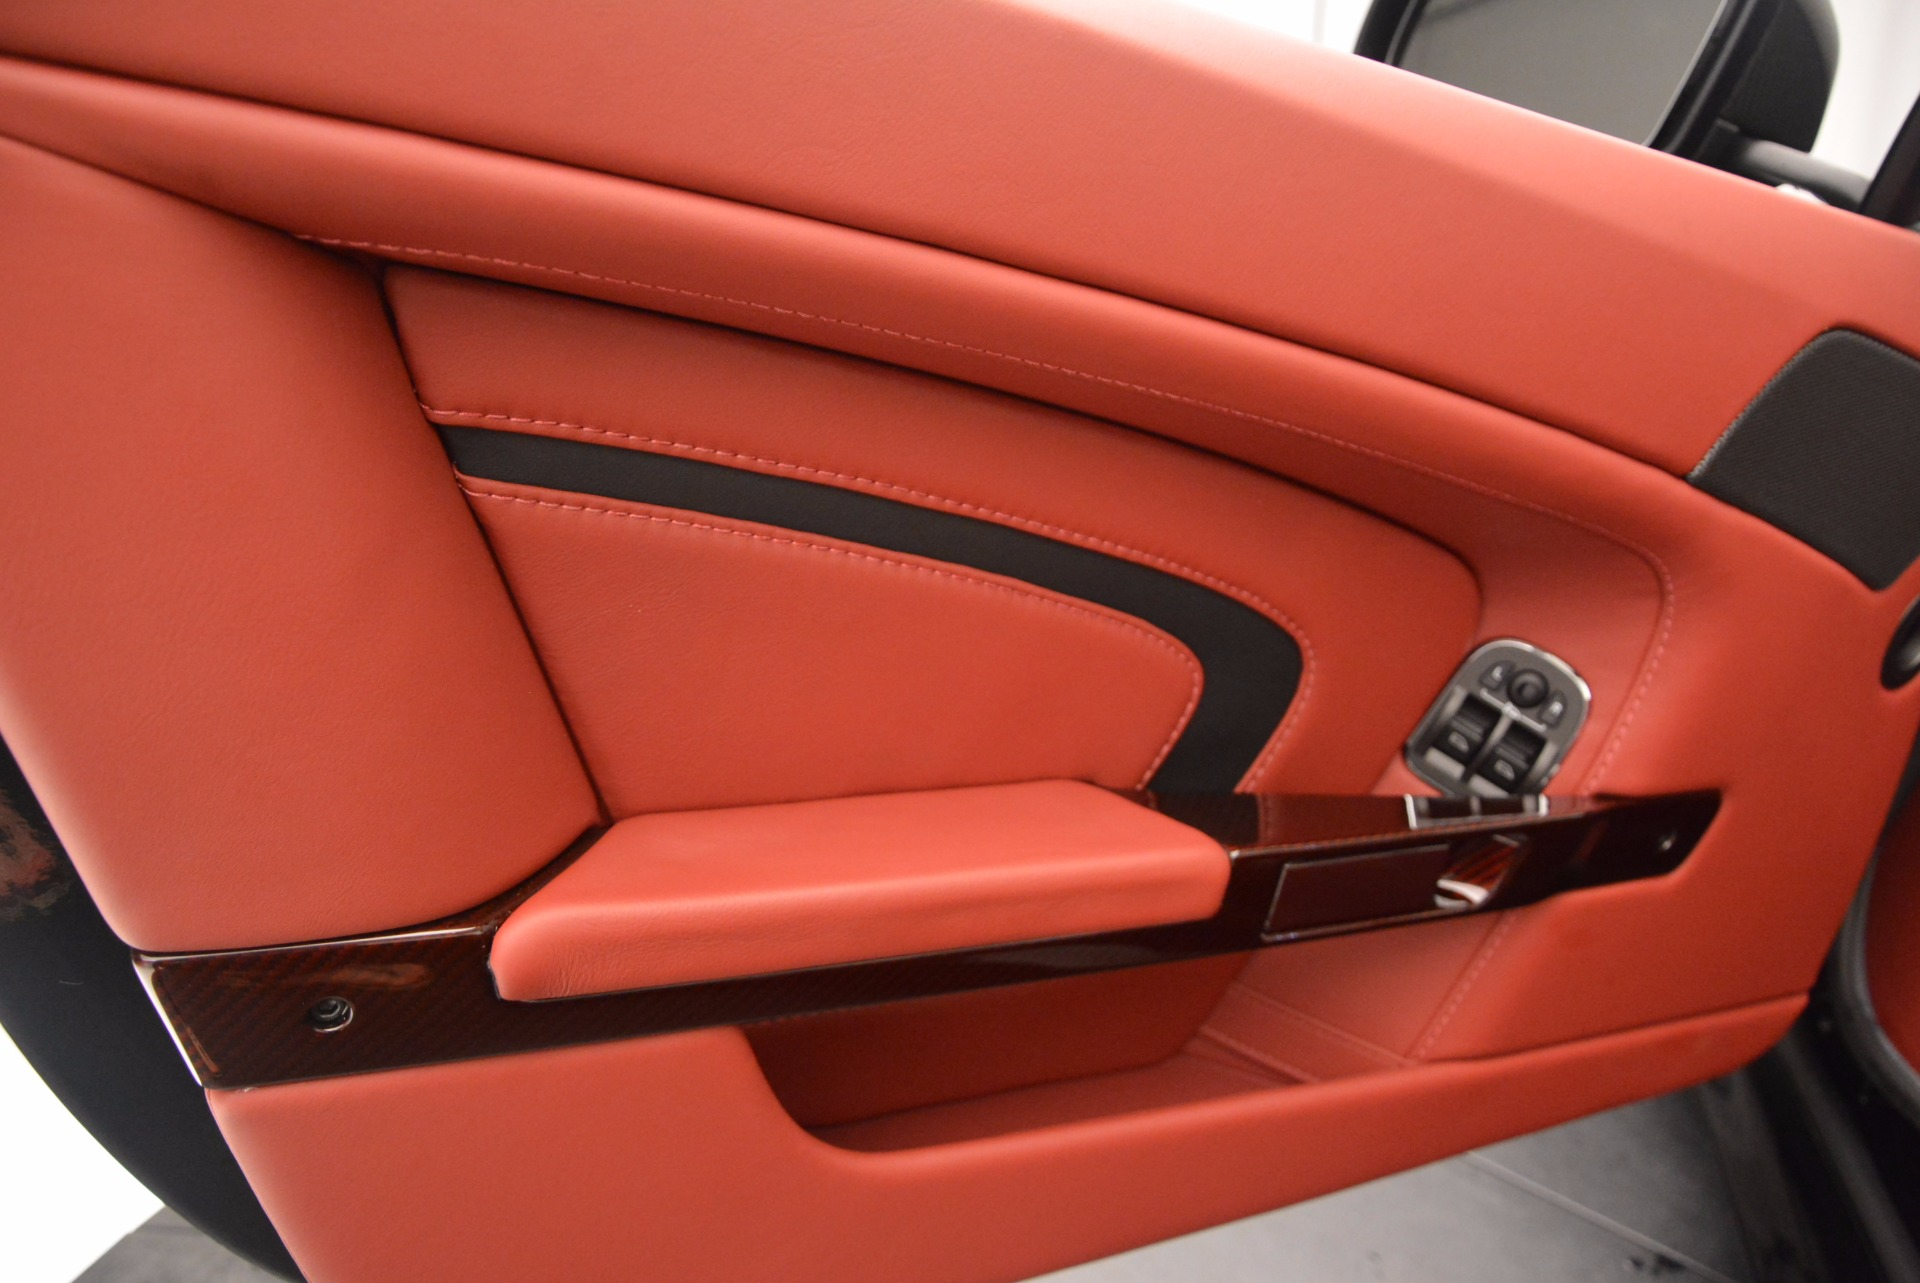 Used 2015 Aston Martin V12 Vantage S Roadster For Sale In Greenwich, CT. Alfa Romeo of Greenwich, 7227 1335_p23